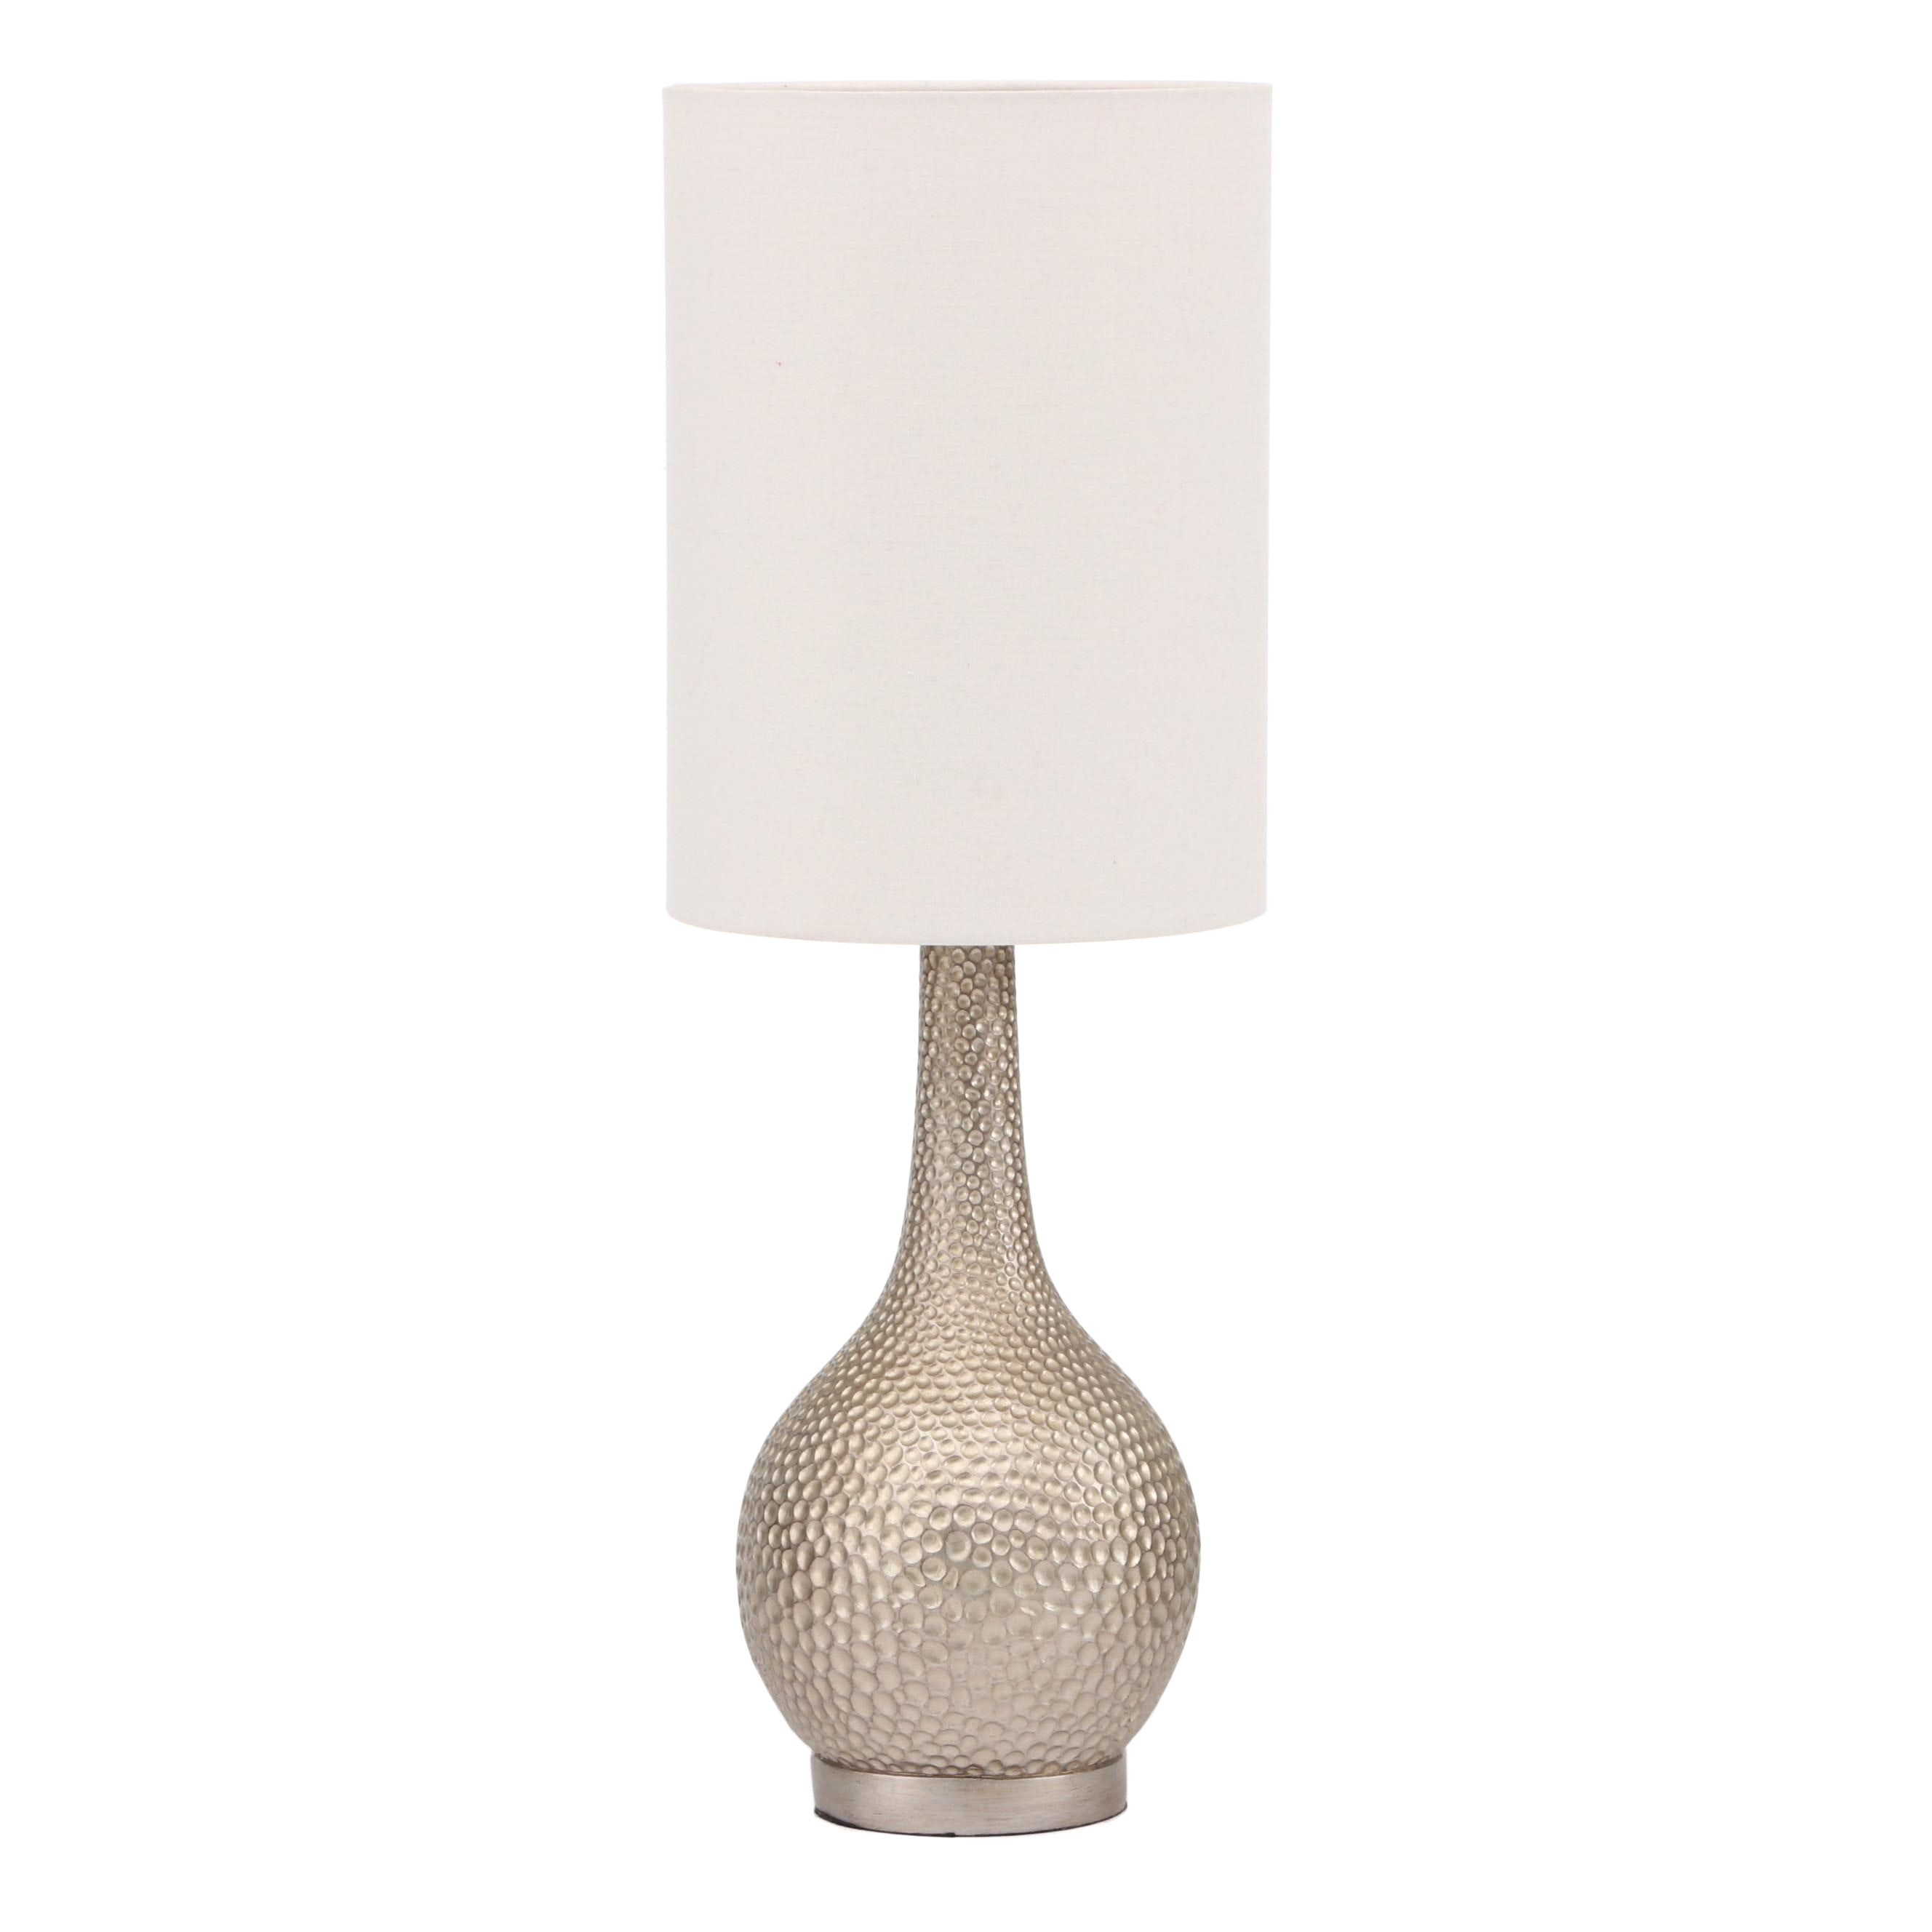 Metallic Textured Composite Table Lamp